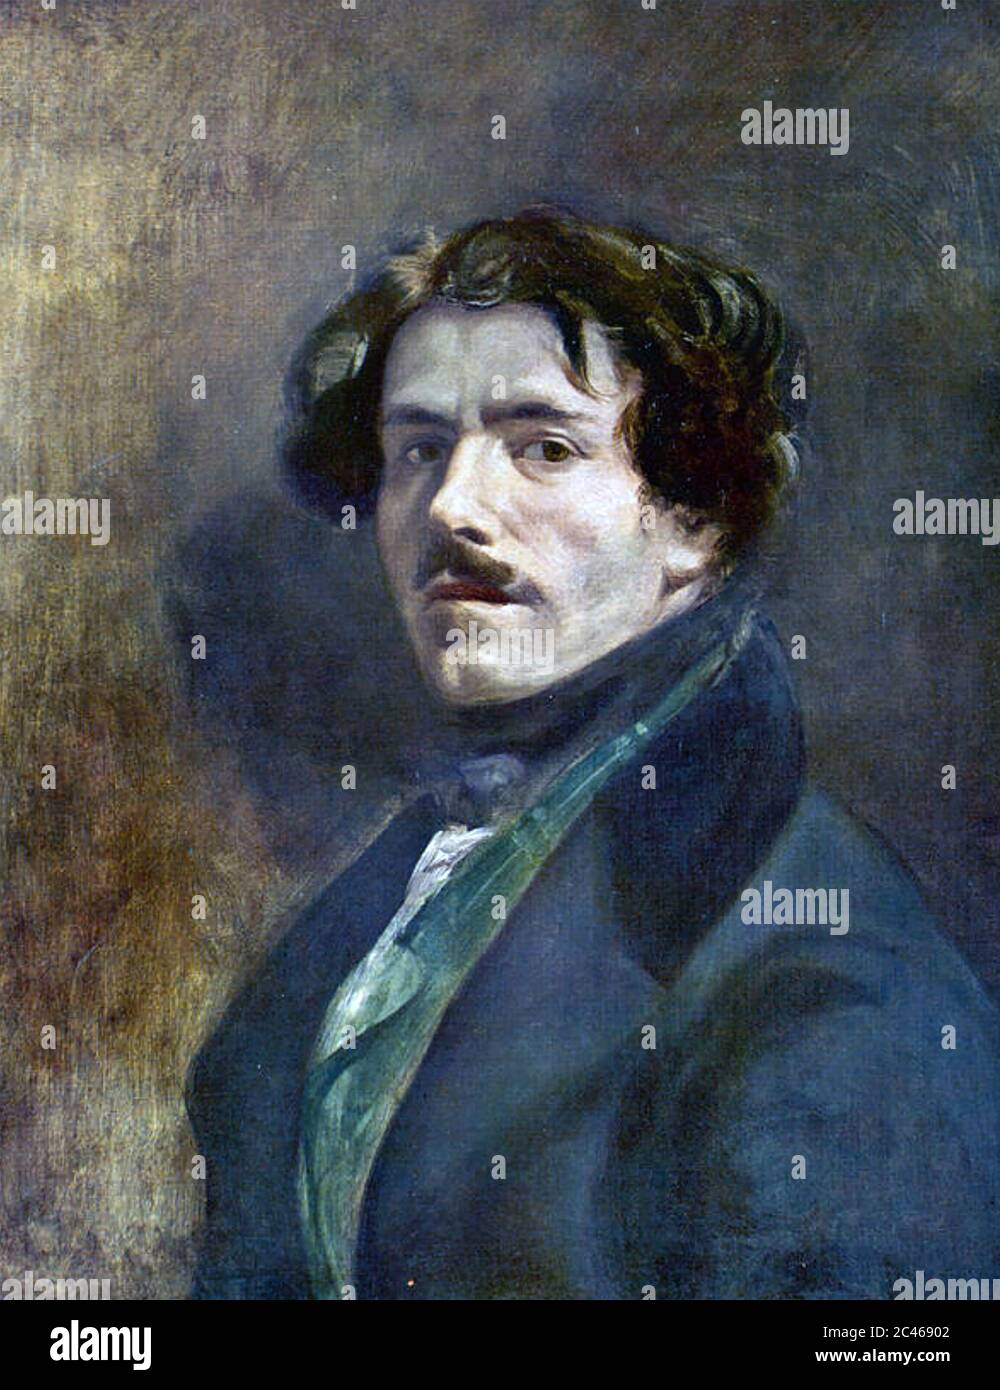 FERDINAND EUGÈNE DELACROIX (1798-1863) French Romantic artist Stock Photo